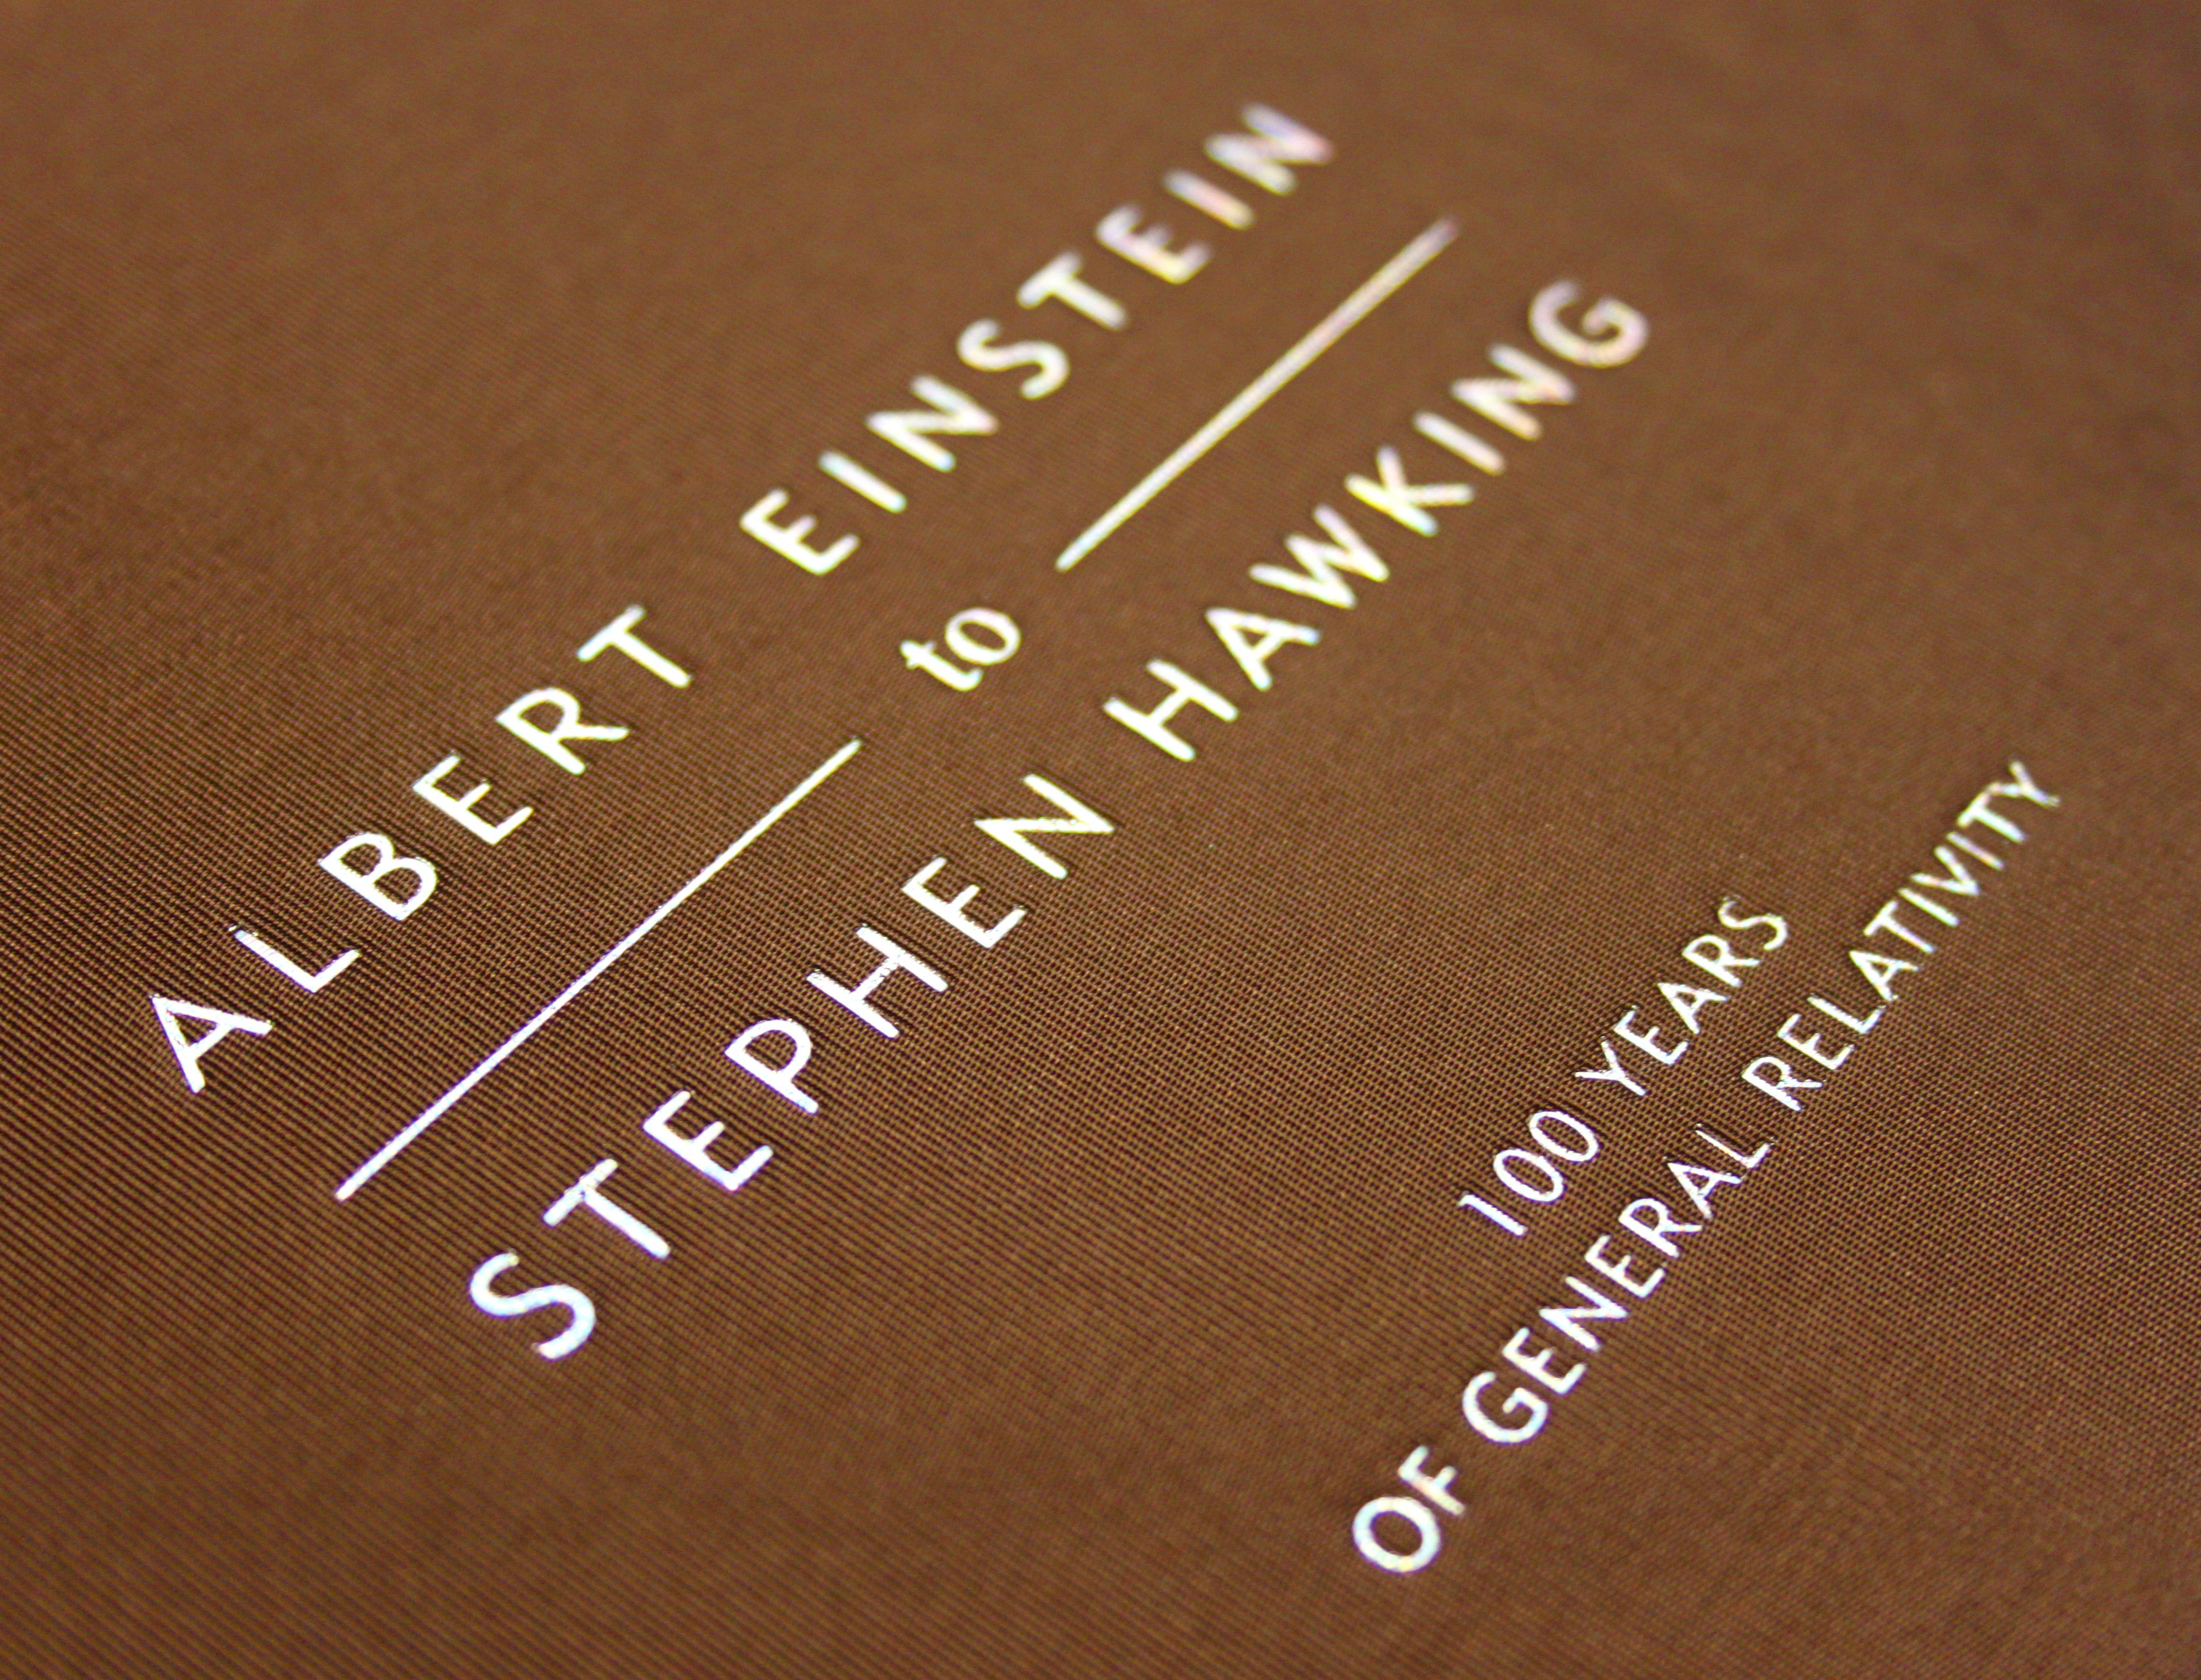 hawking_redmayne_stamp_book_13